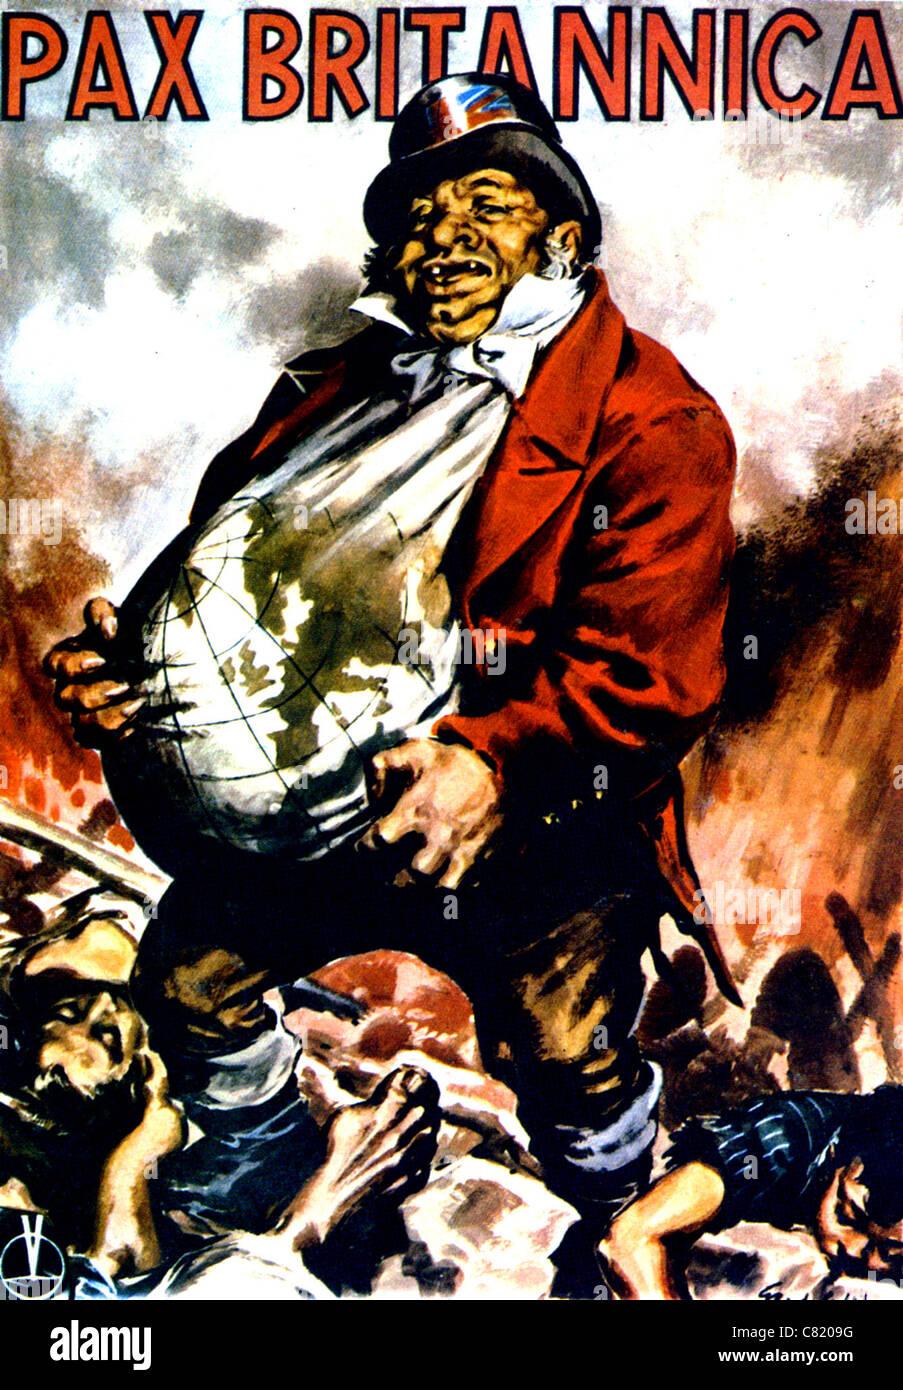 PAX BRITANNICA  Italian WW2 poster showing John Bull seeking to dominate Europe - Stock Image